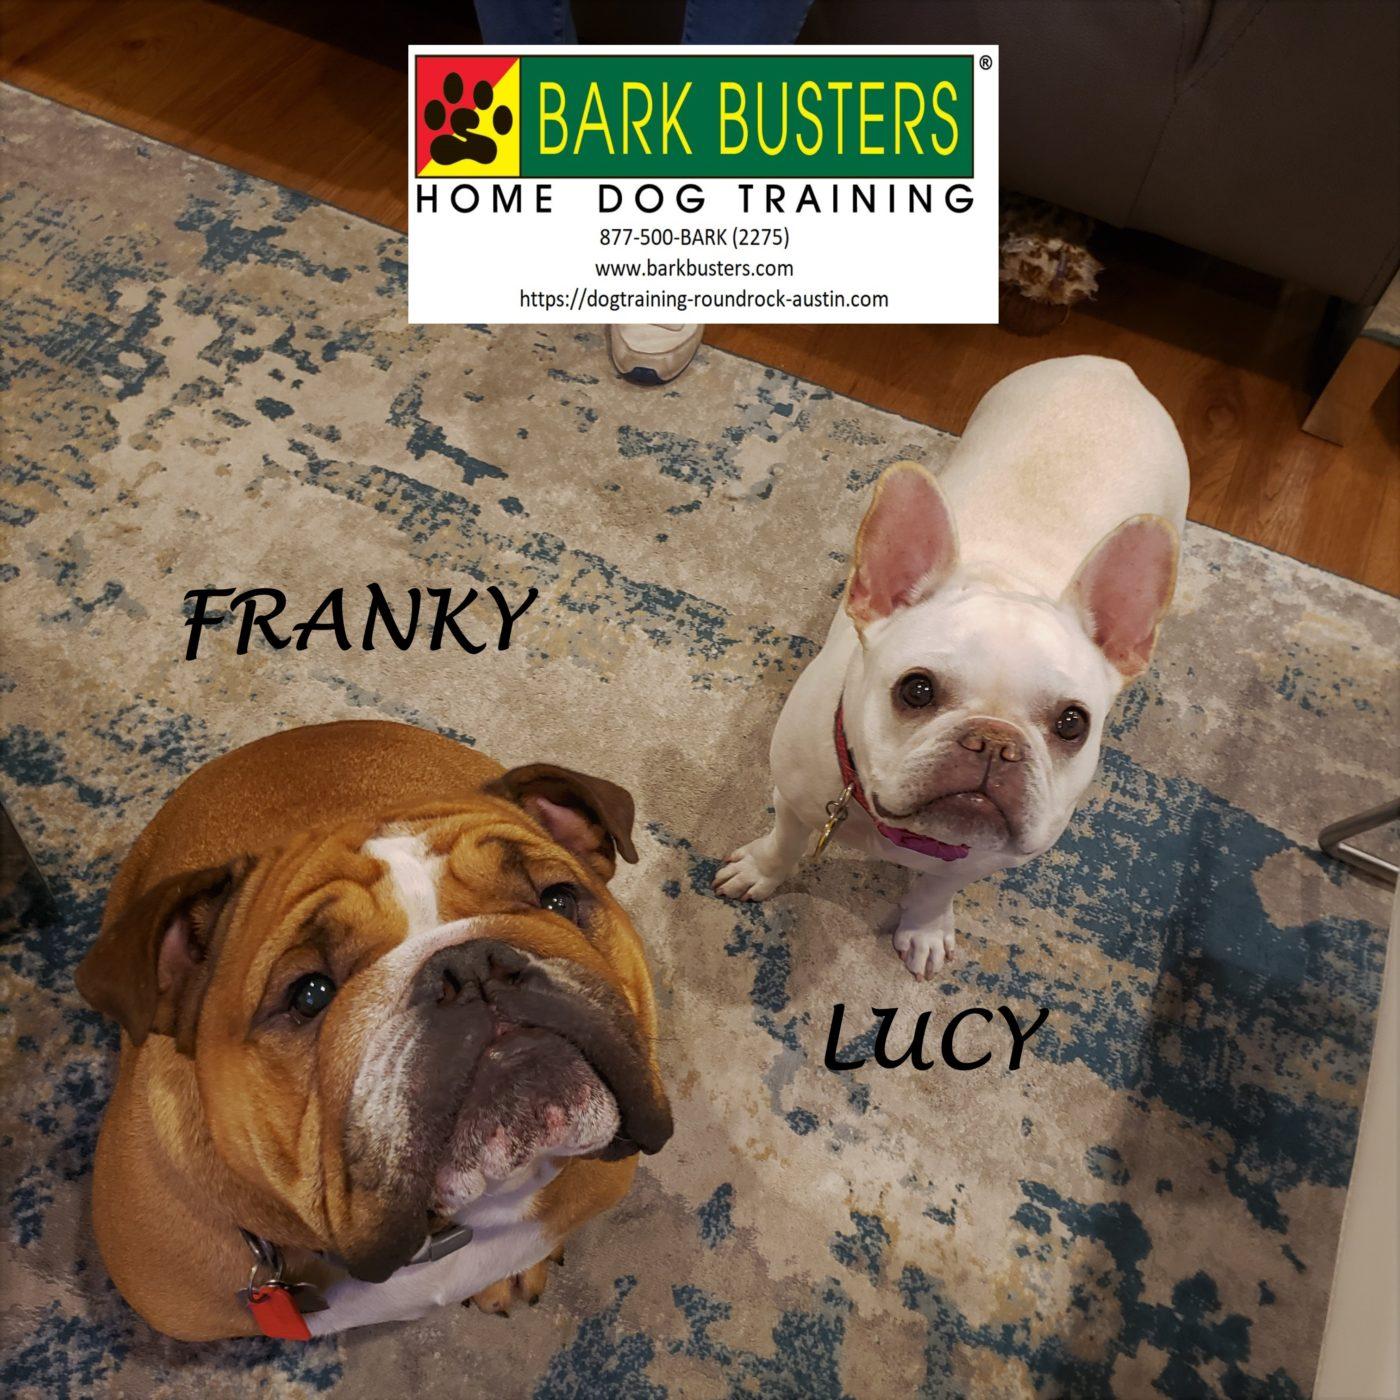 #englishbulldog #frenchbulldog #dogtrainingaustin #dogtrainingroundrock #fearaggression #doormanners #dogsofbarkbusters #barkbusters #speakdog #inhomedogtraining